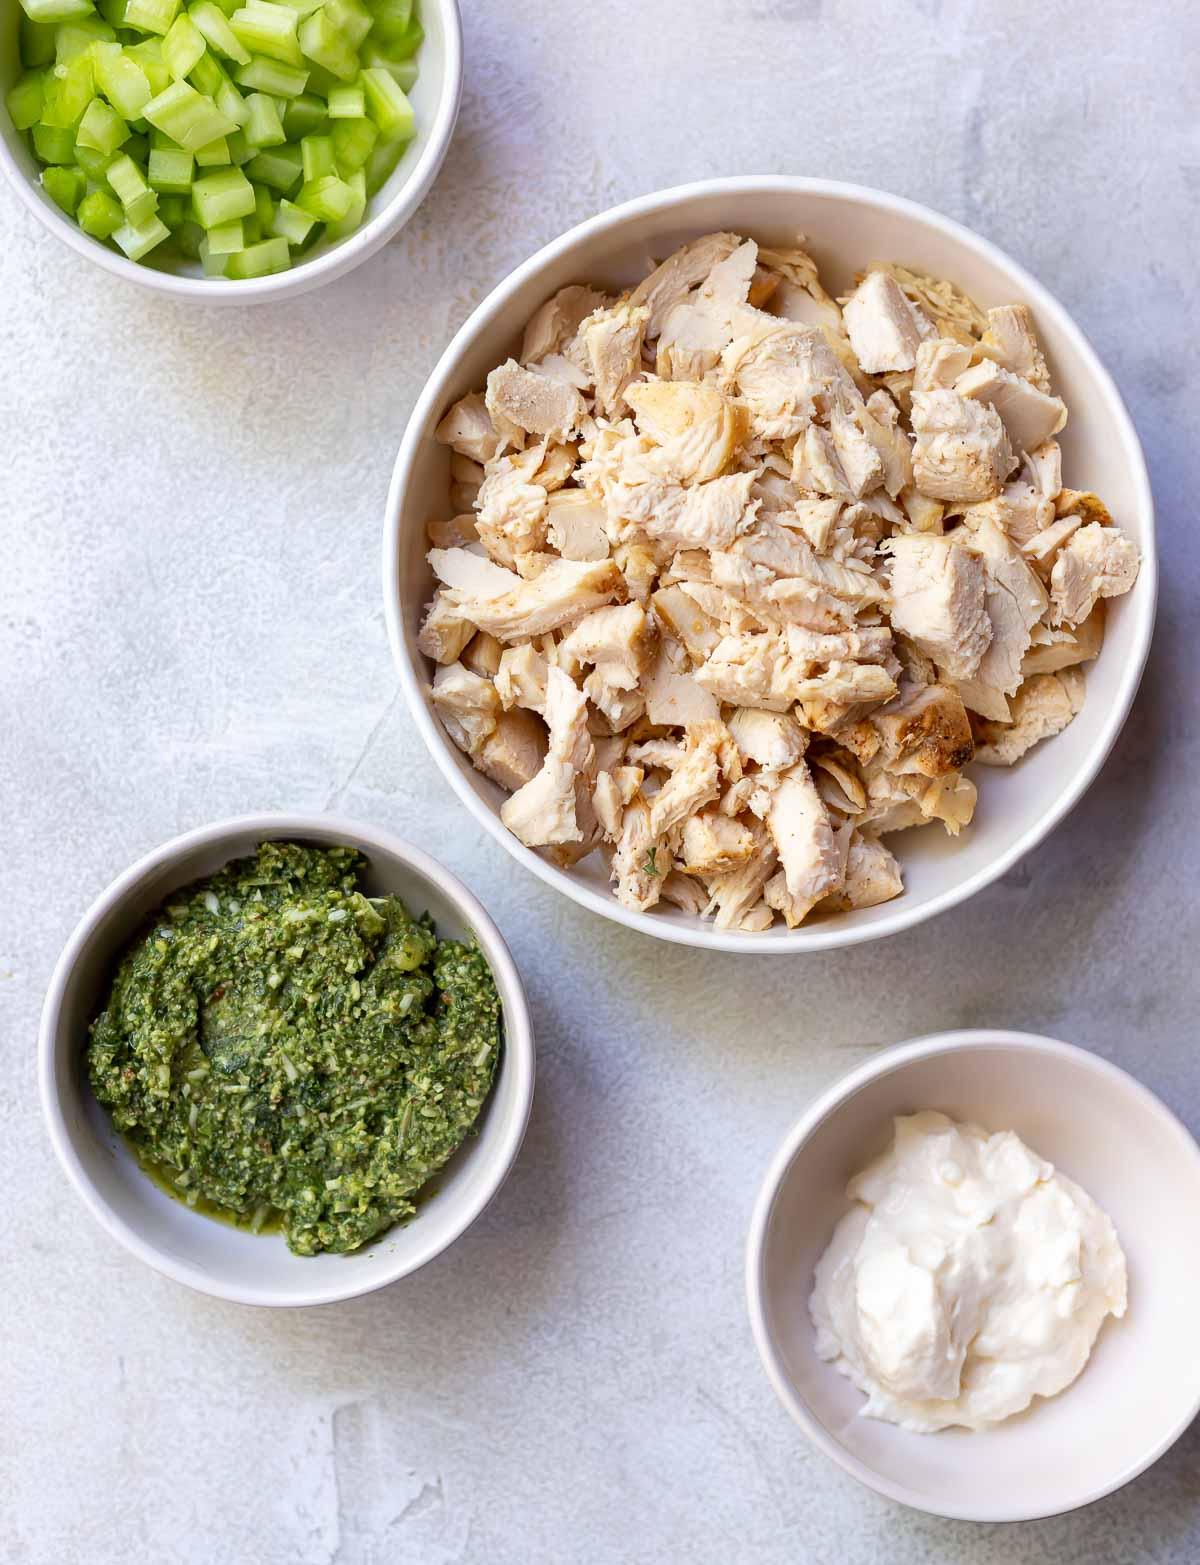 ingredients for chicken salad recipe in white bowls